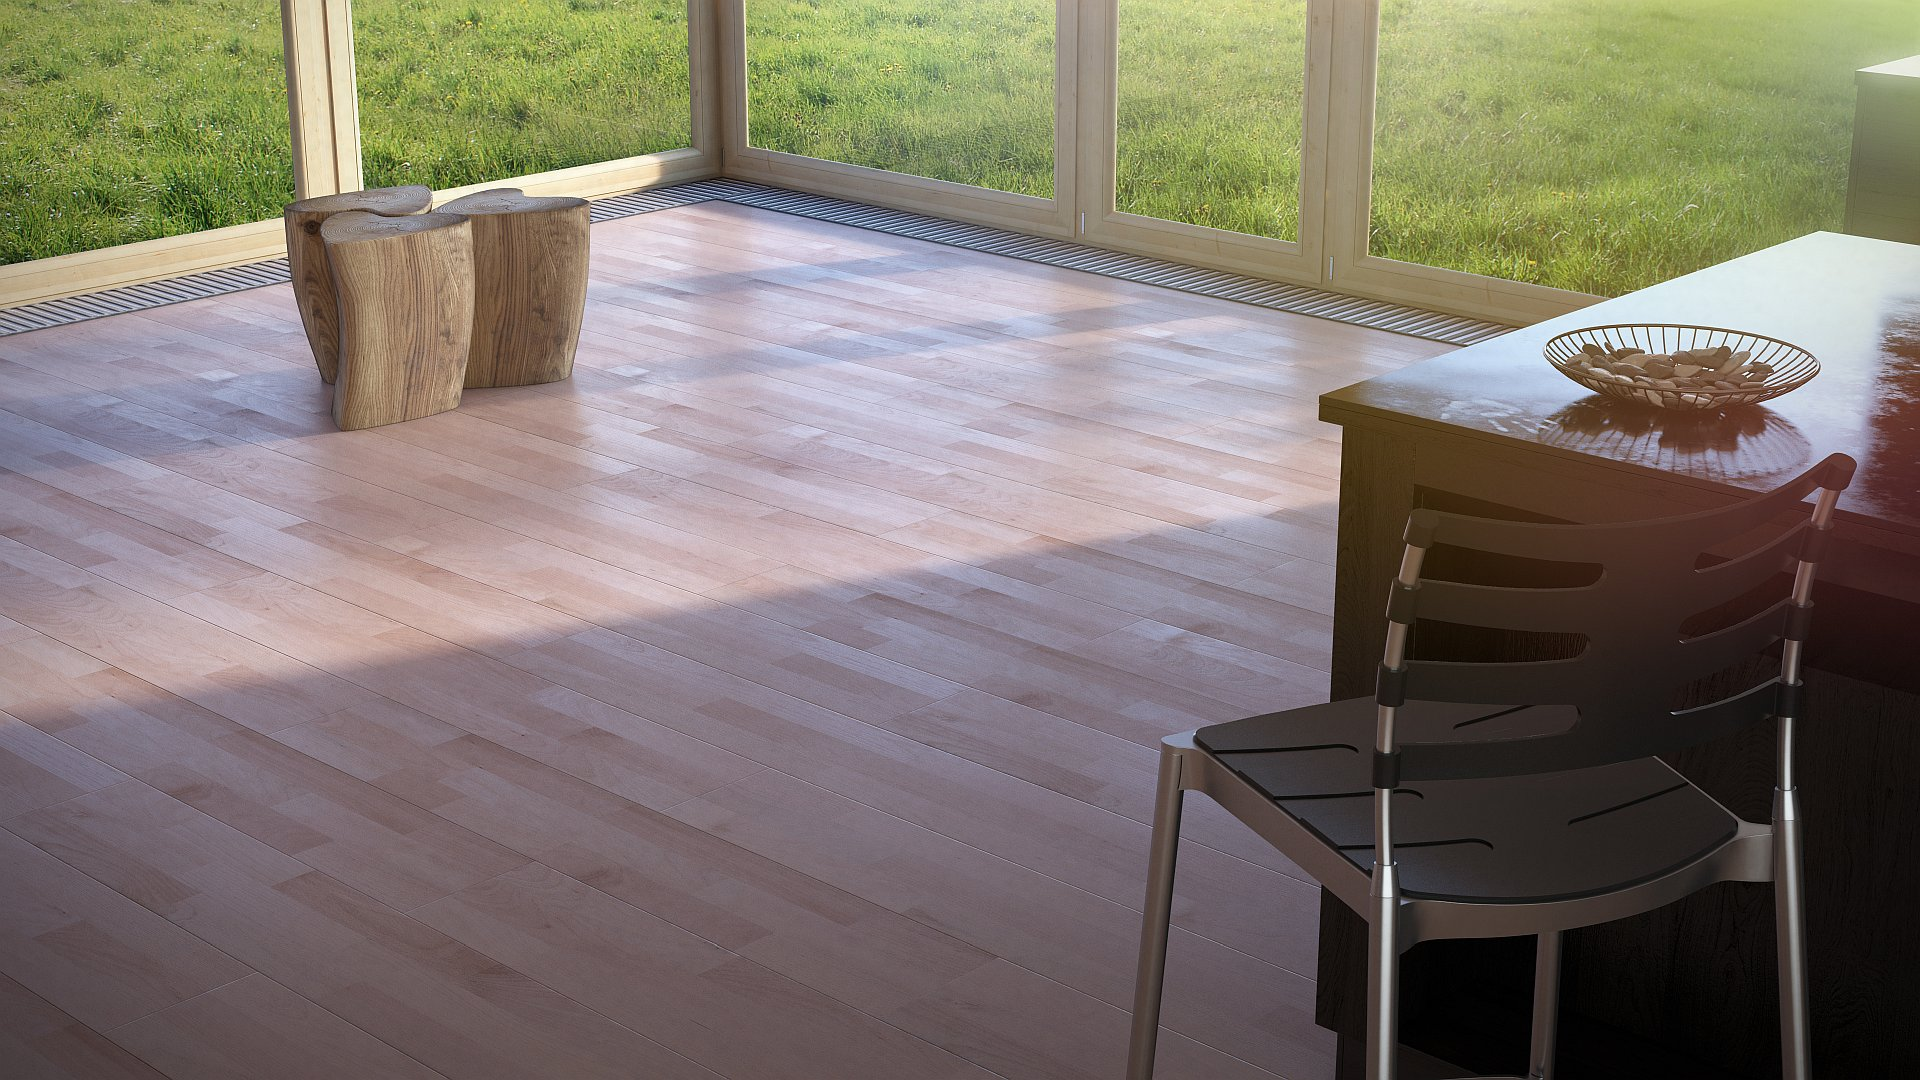 Beech - wooden planks